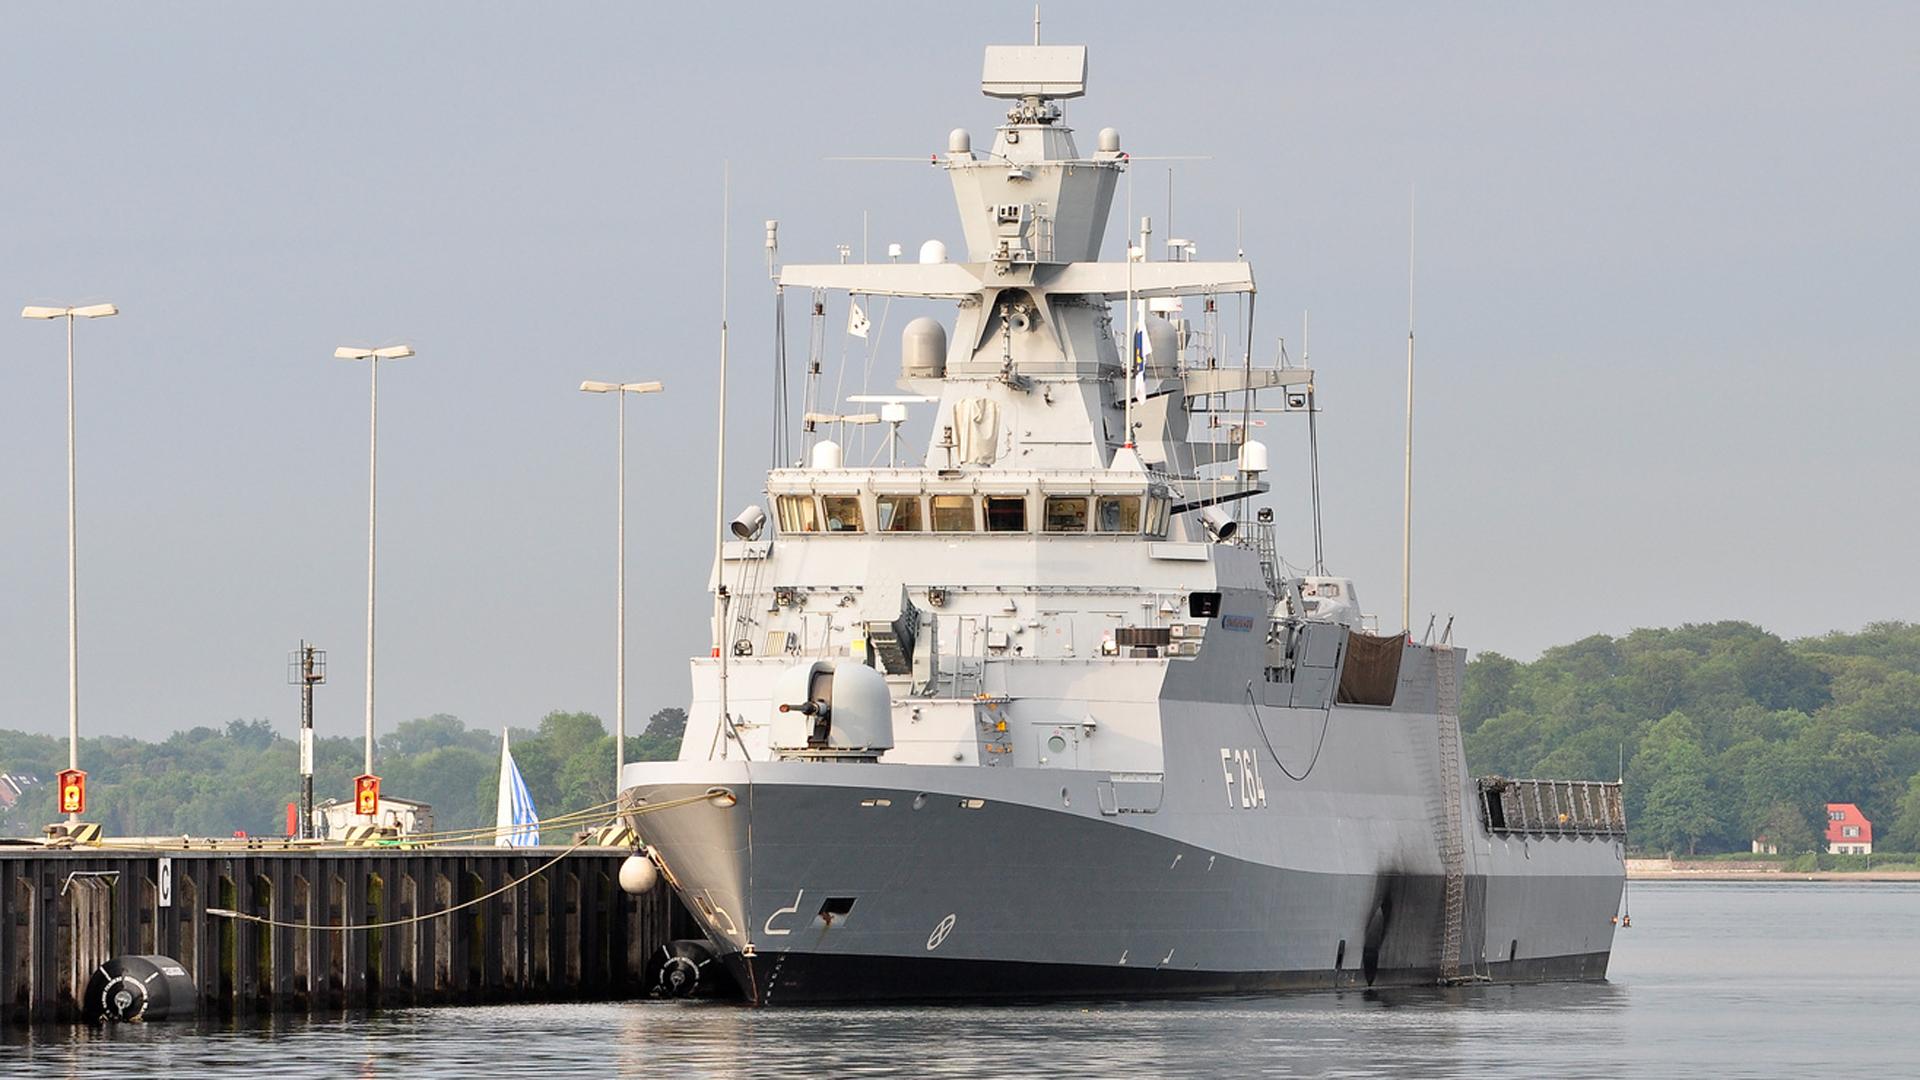 Marineschiff im Hafen